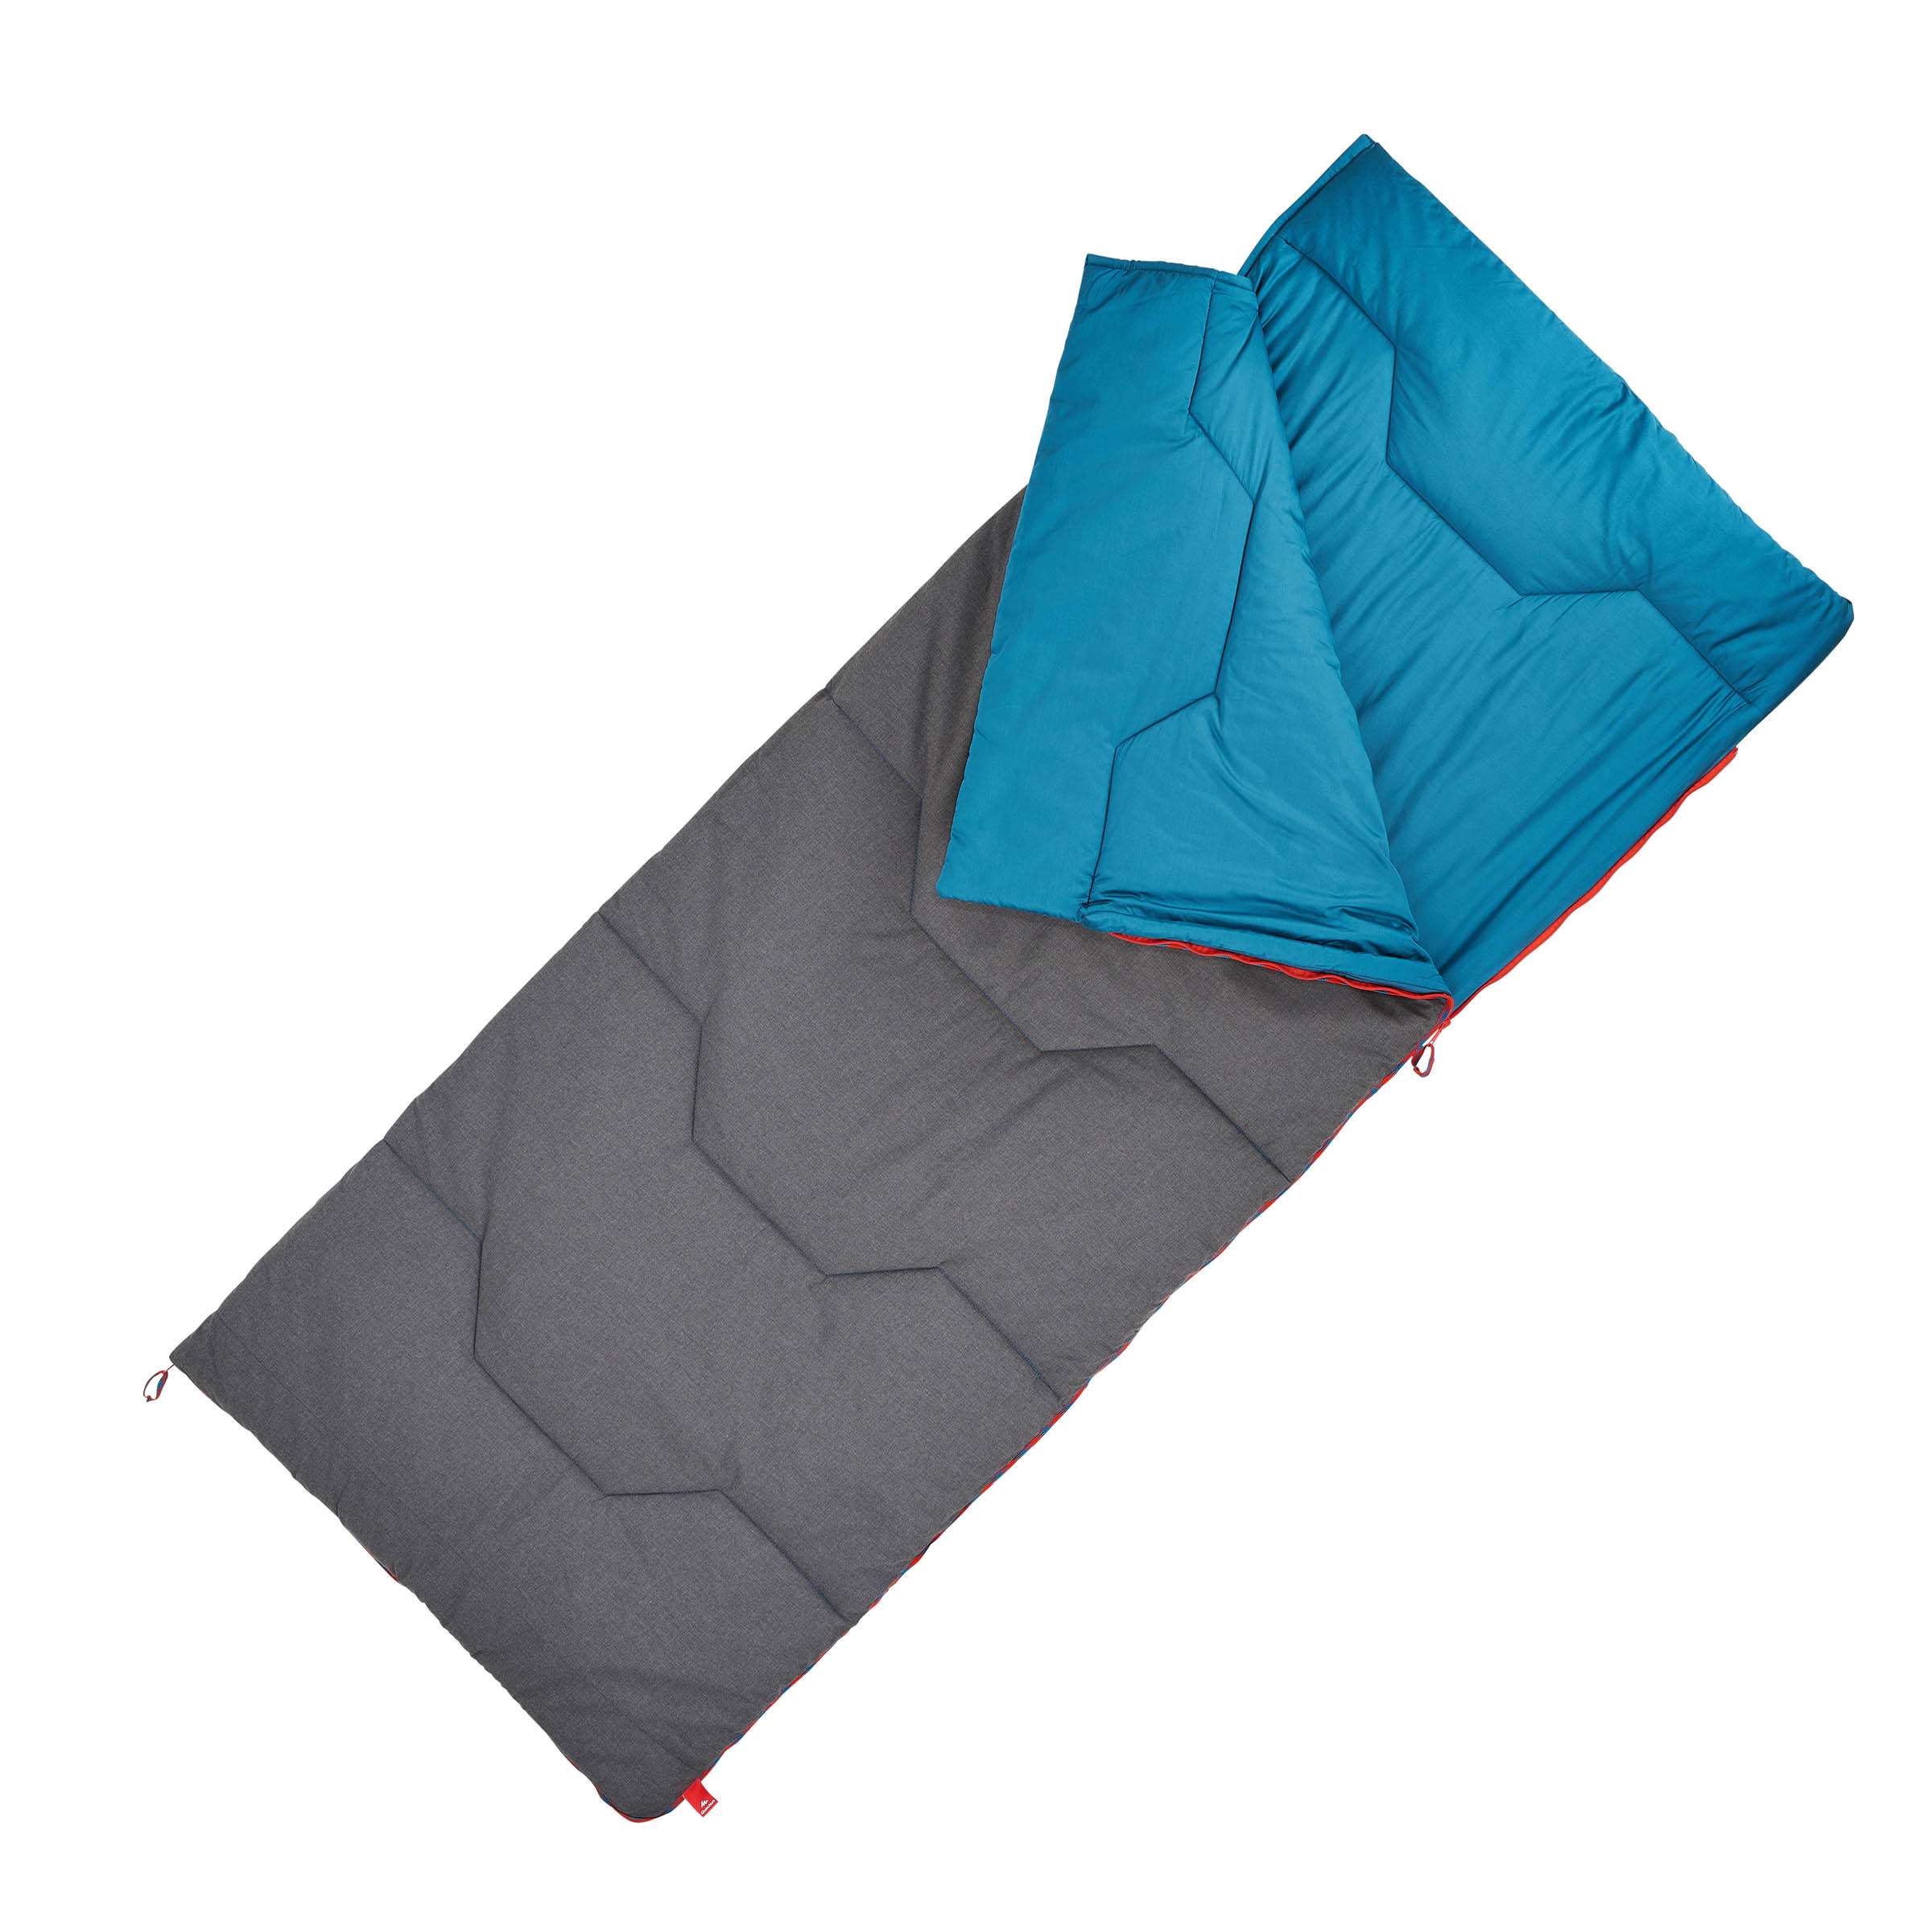 3 Season Sac de couchage Sleeping Bag Angler Sac de couchage All Season 5